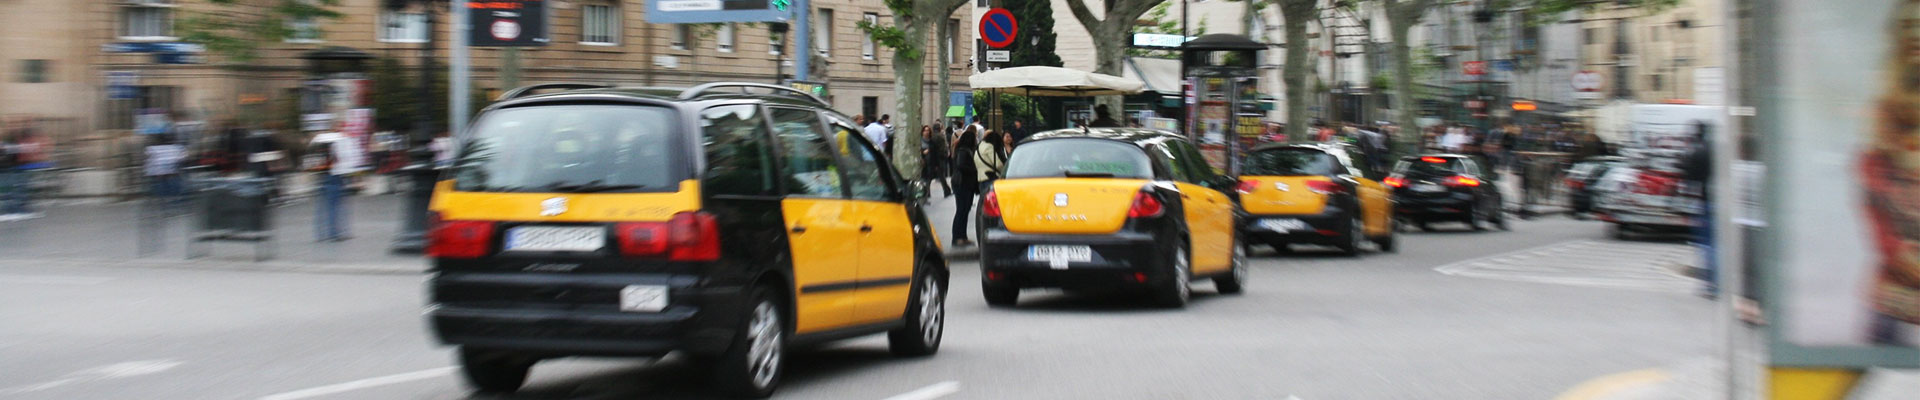 taxi-barcelona